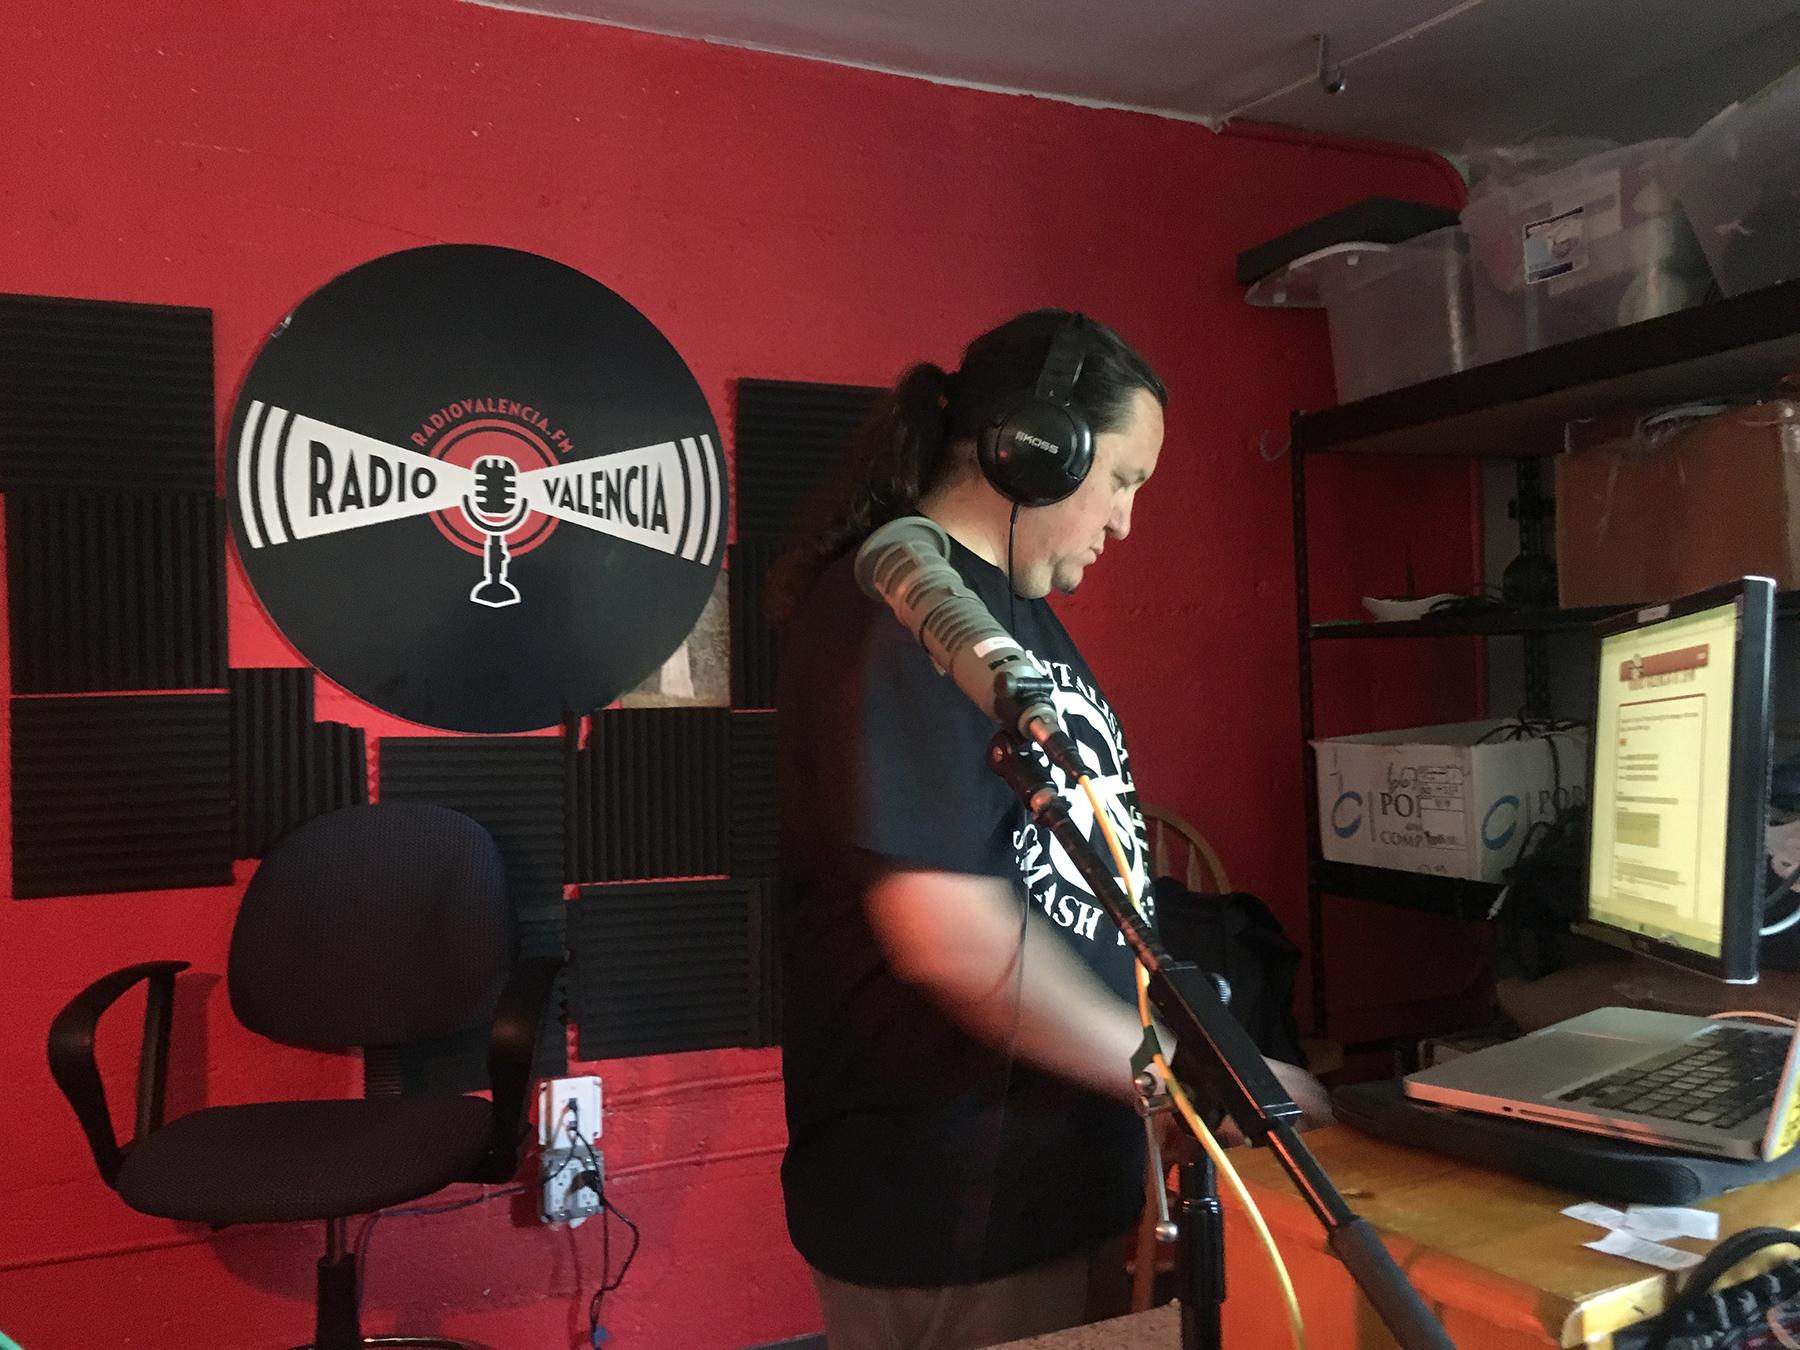 Malderor of Radio valencia